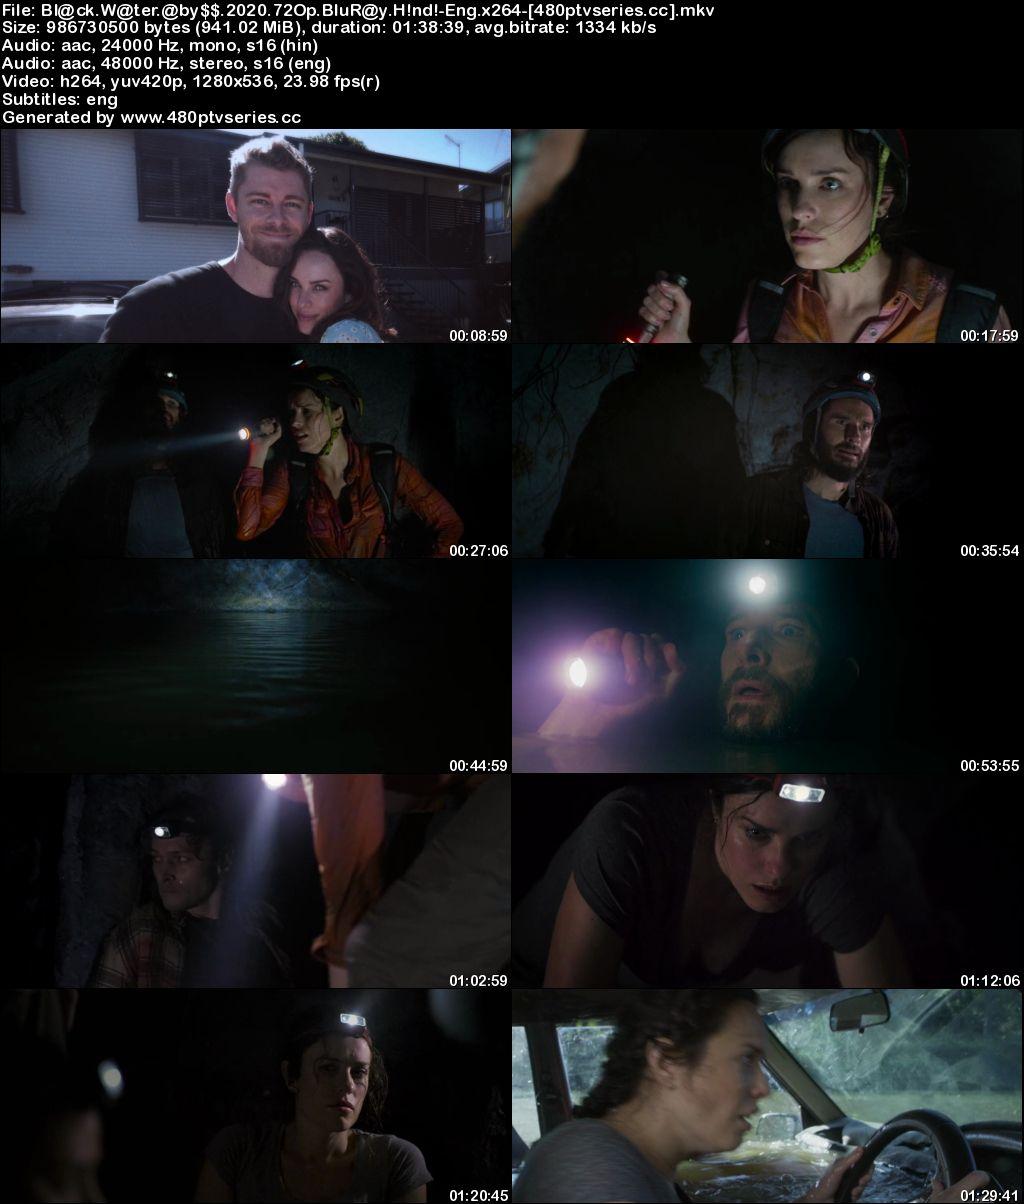 Black Water: Abyss (2020) Full Hindi Dual Audio Movie Download 480p 720p Web-DL Free  Watch Online Full Movie Download Worldfree4u 9xmovies